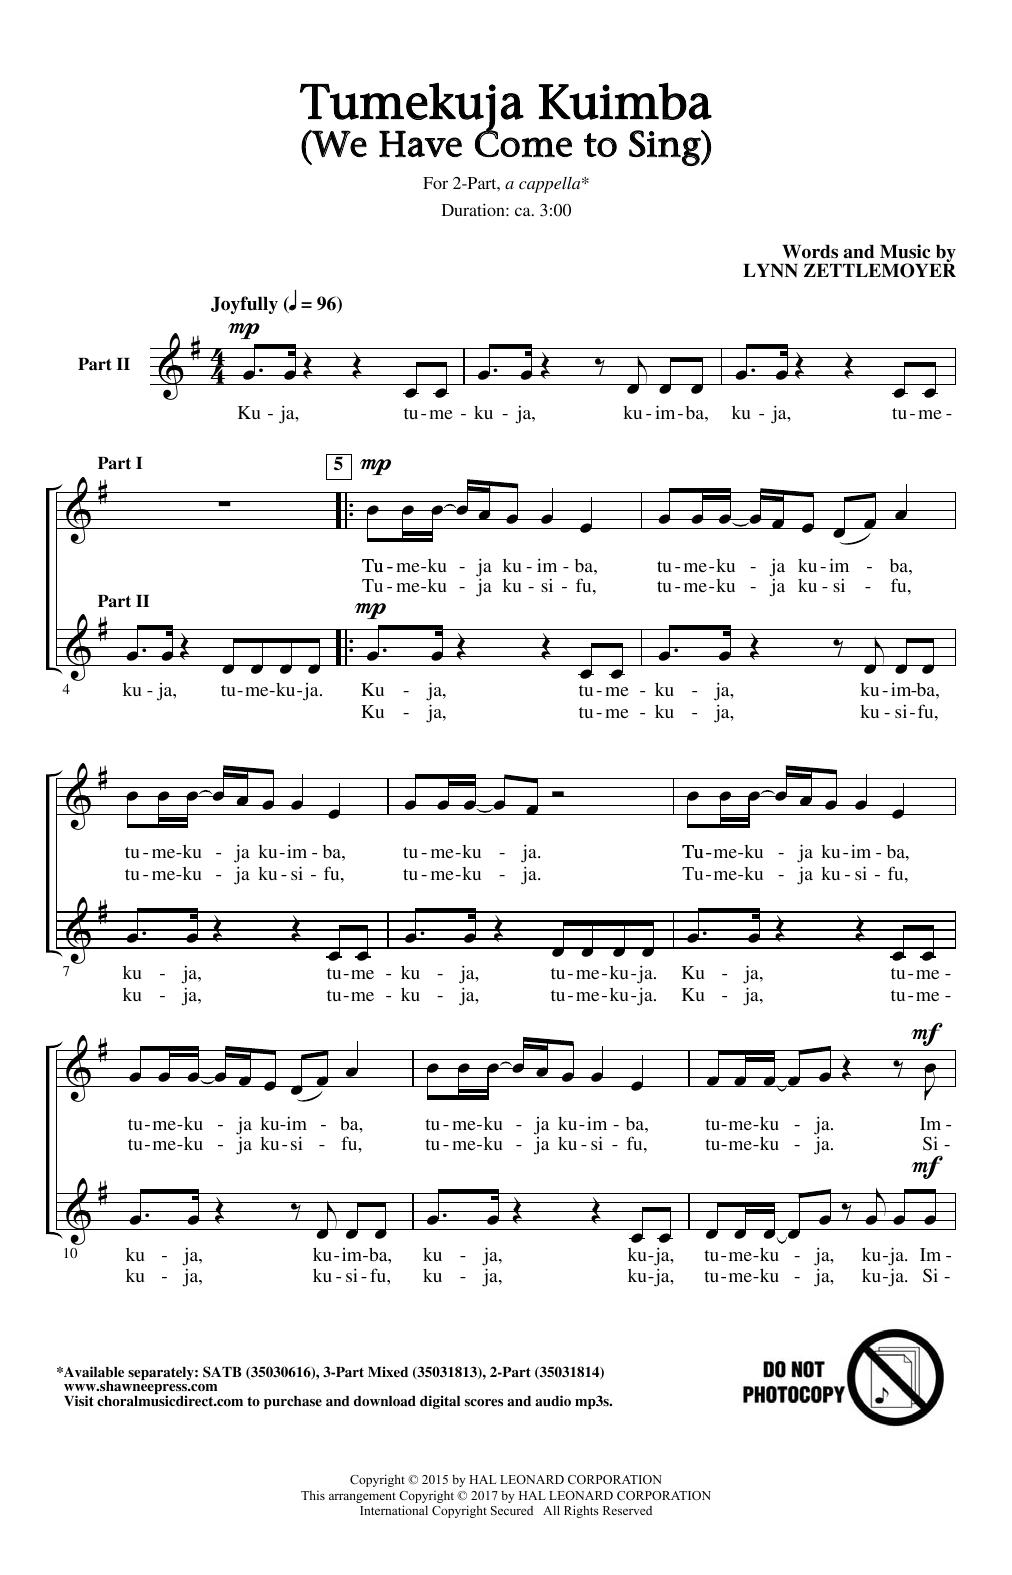 Tumekuja Kuimba (We Have Come To Sing!) Sheet Music